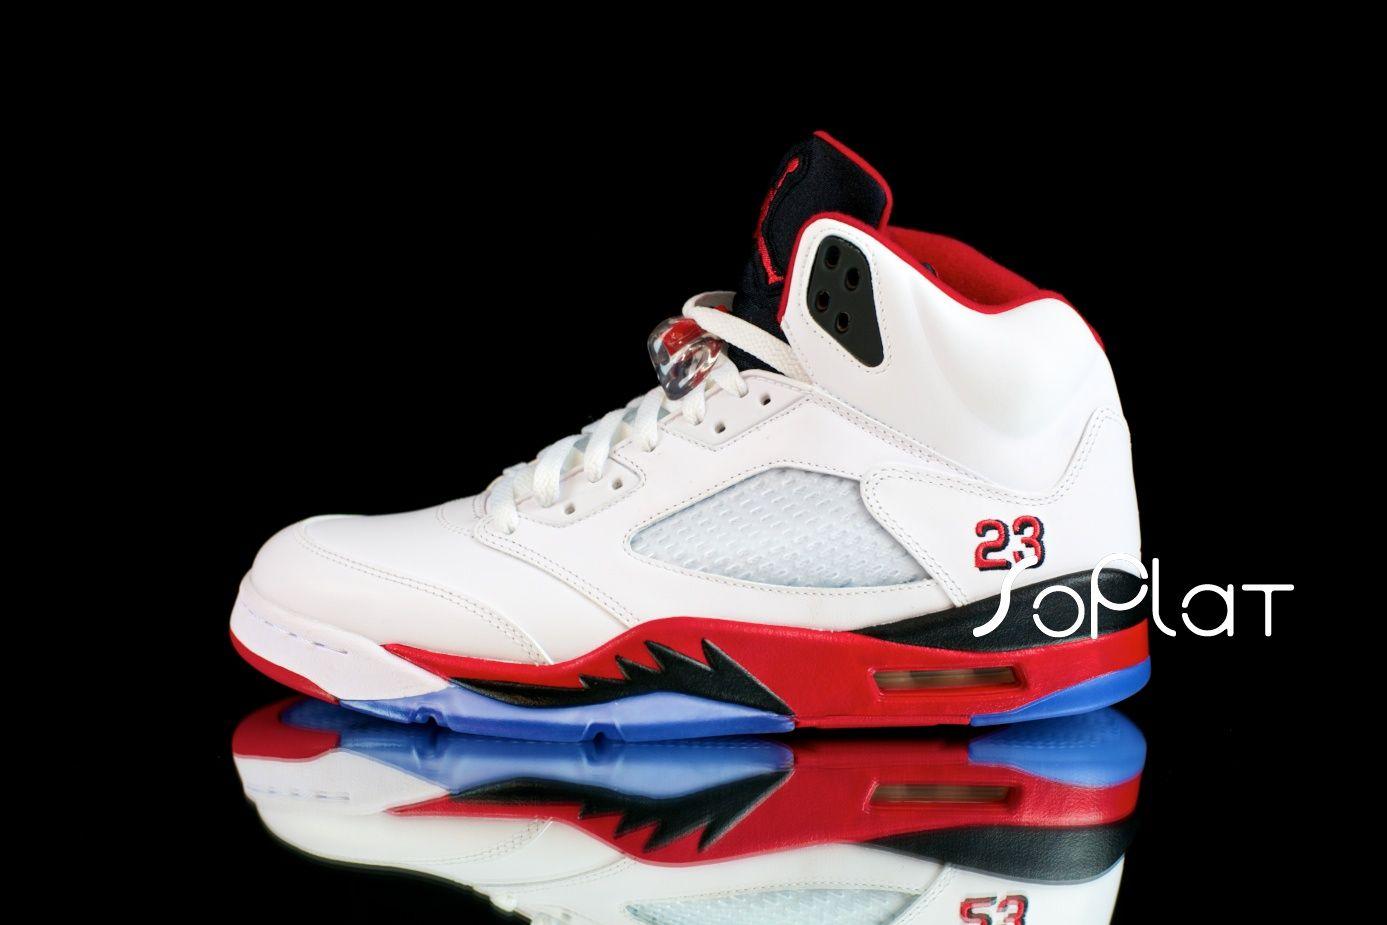 Air Jordan 5 Retro 3Lab5 Black Infrared 23 New Detailed Pictures |  KixandtheCity.com: Fresh Sneakers | Pinterest | Air jordan, Retro and Detail